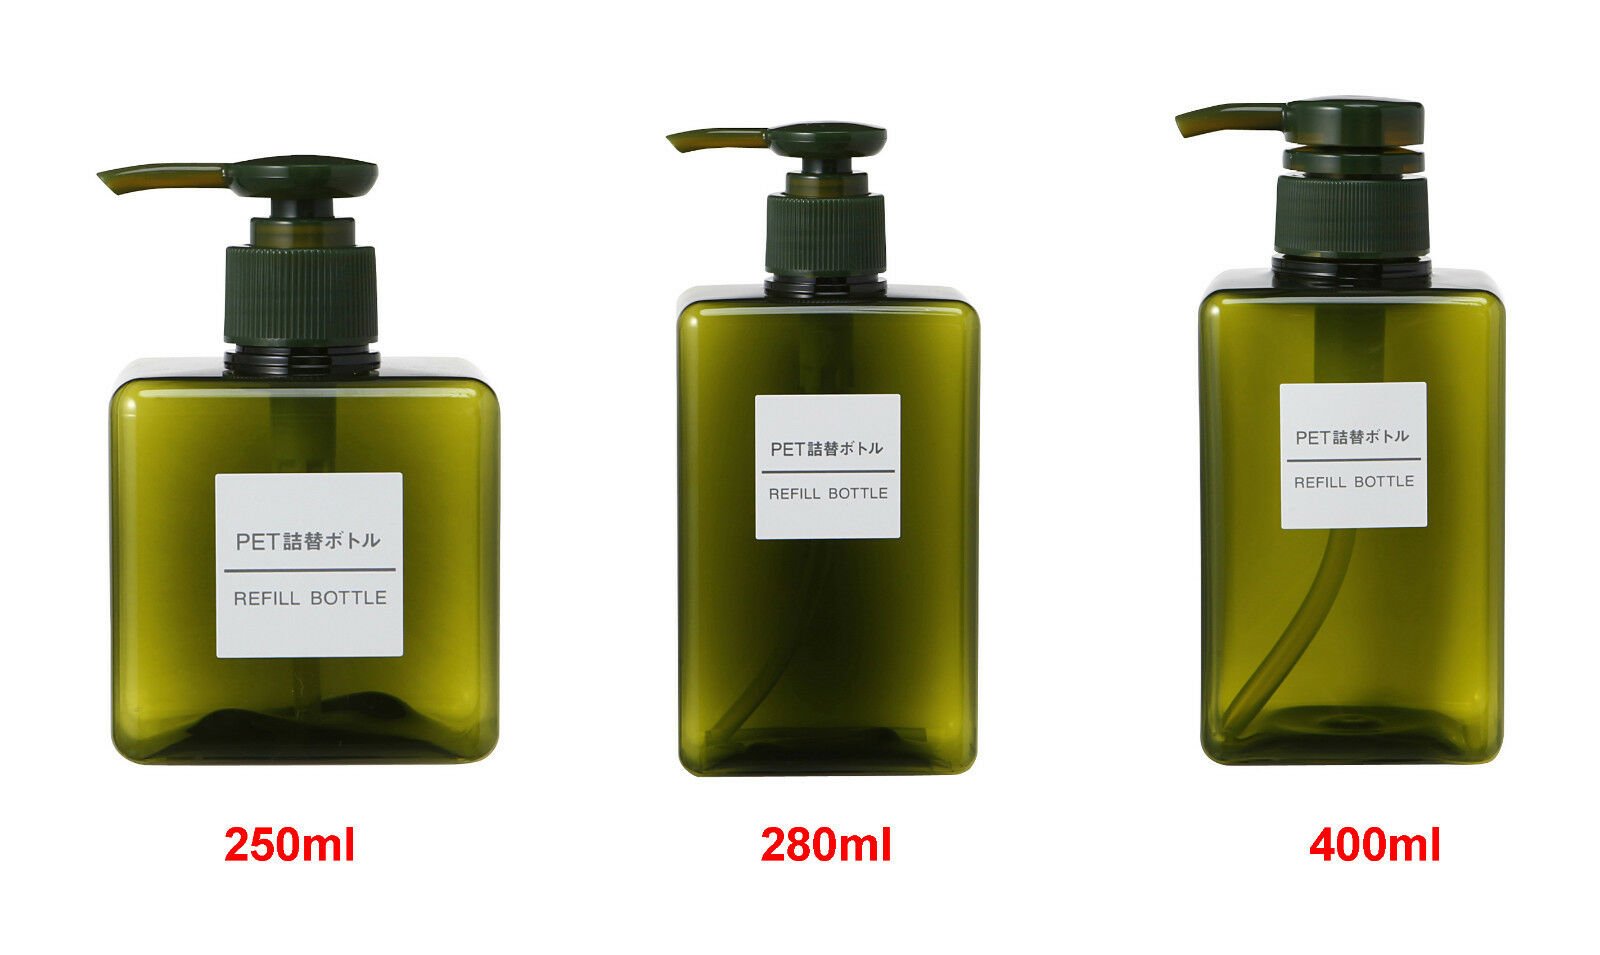 bf50a1a8f0e2 Muji 3 Size PET Green Refill Pump Bottles Choose Size 250ml, 280ml, 400ml